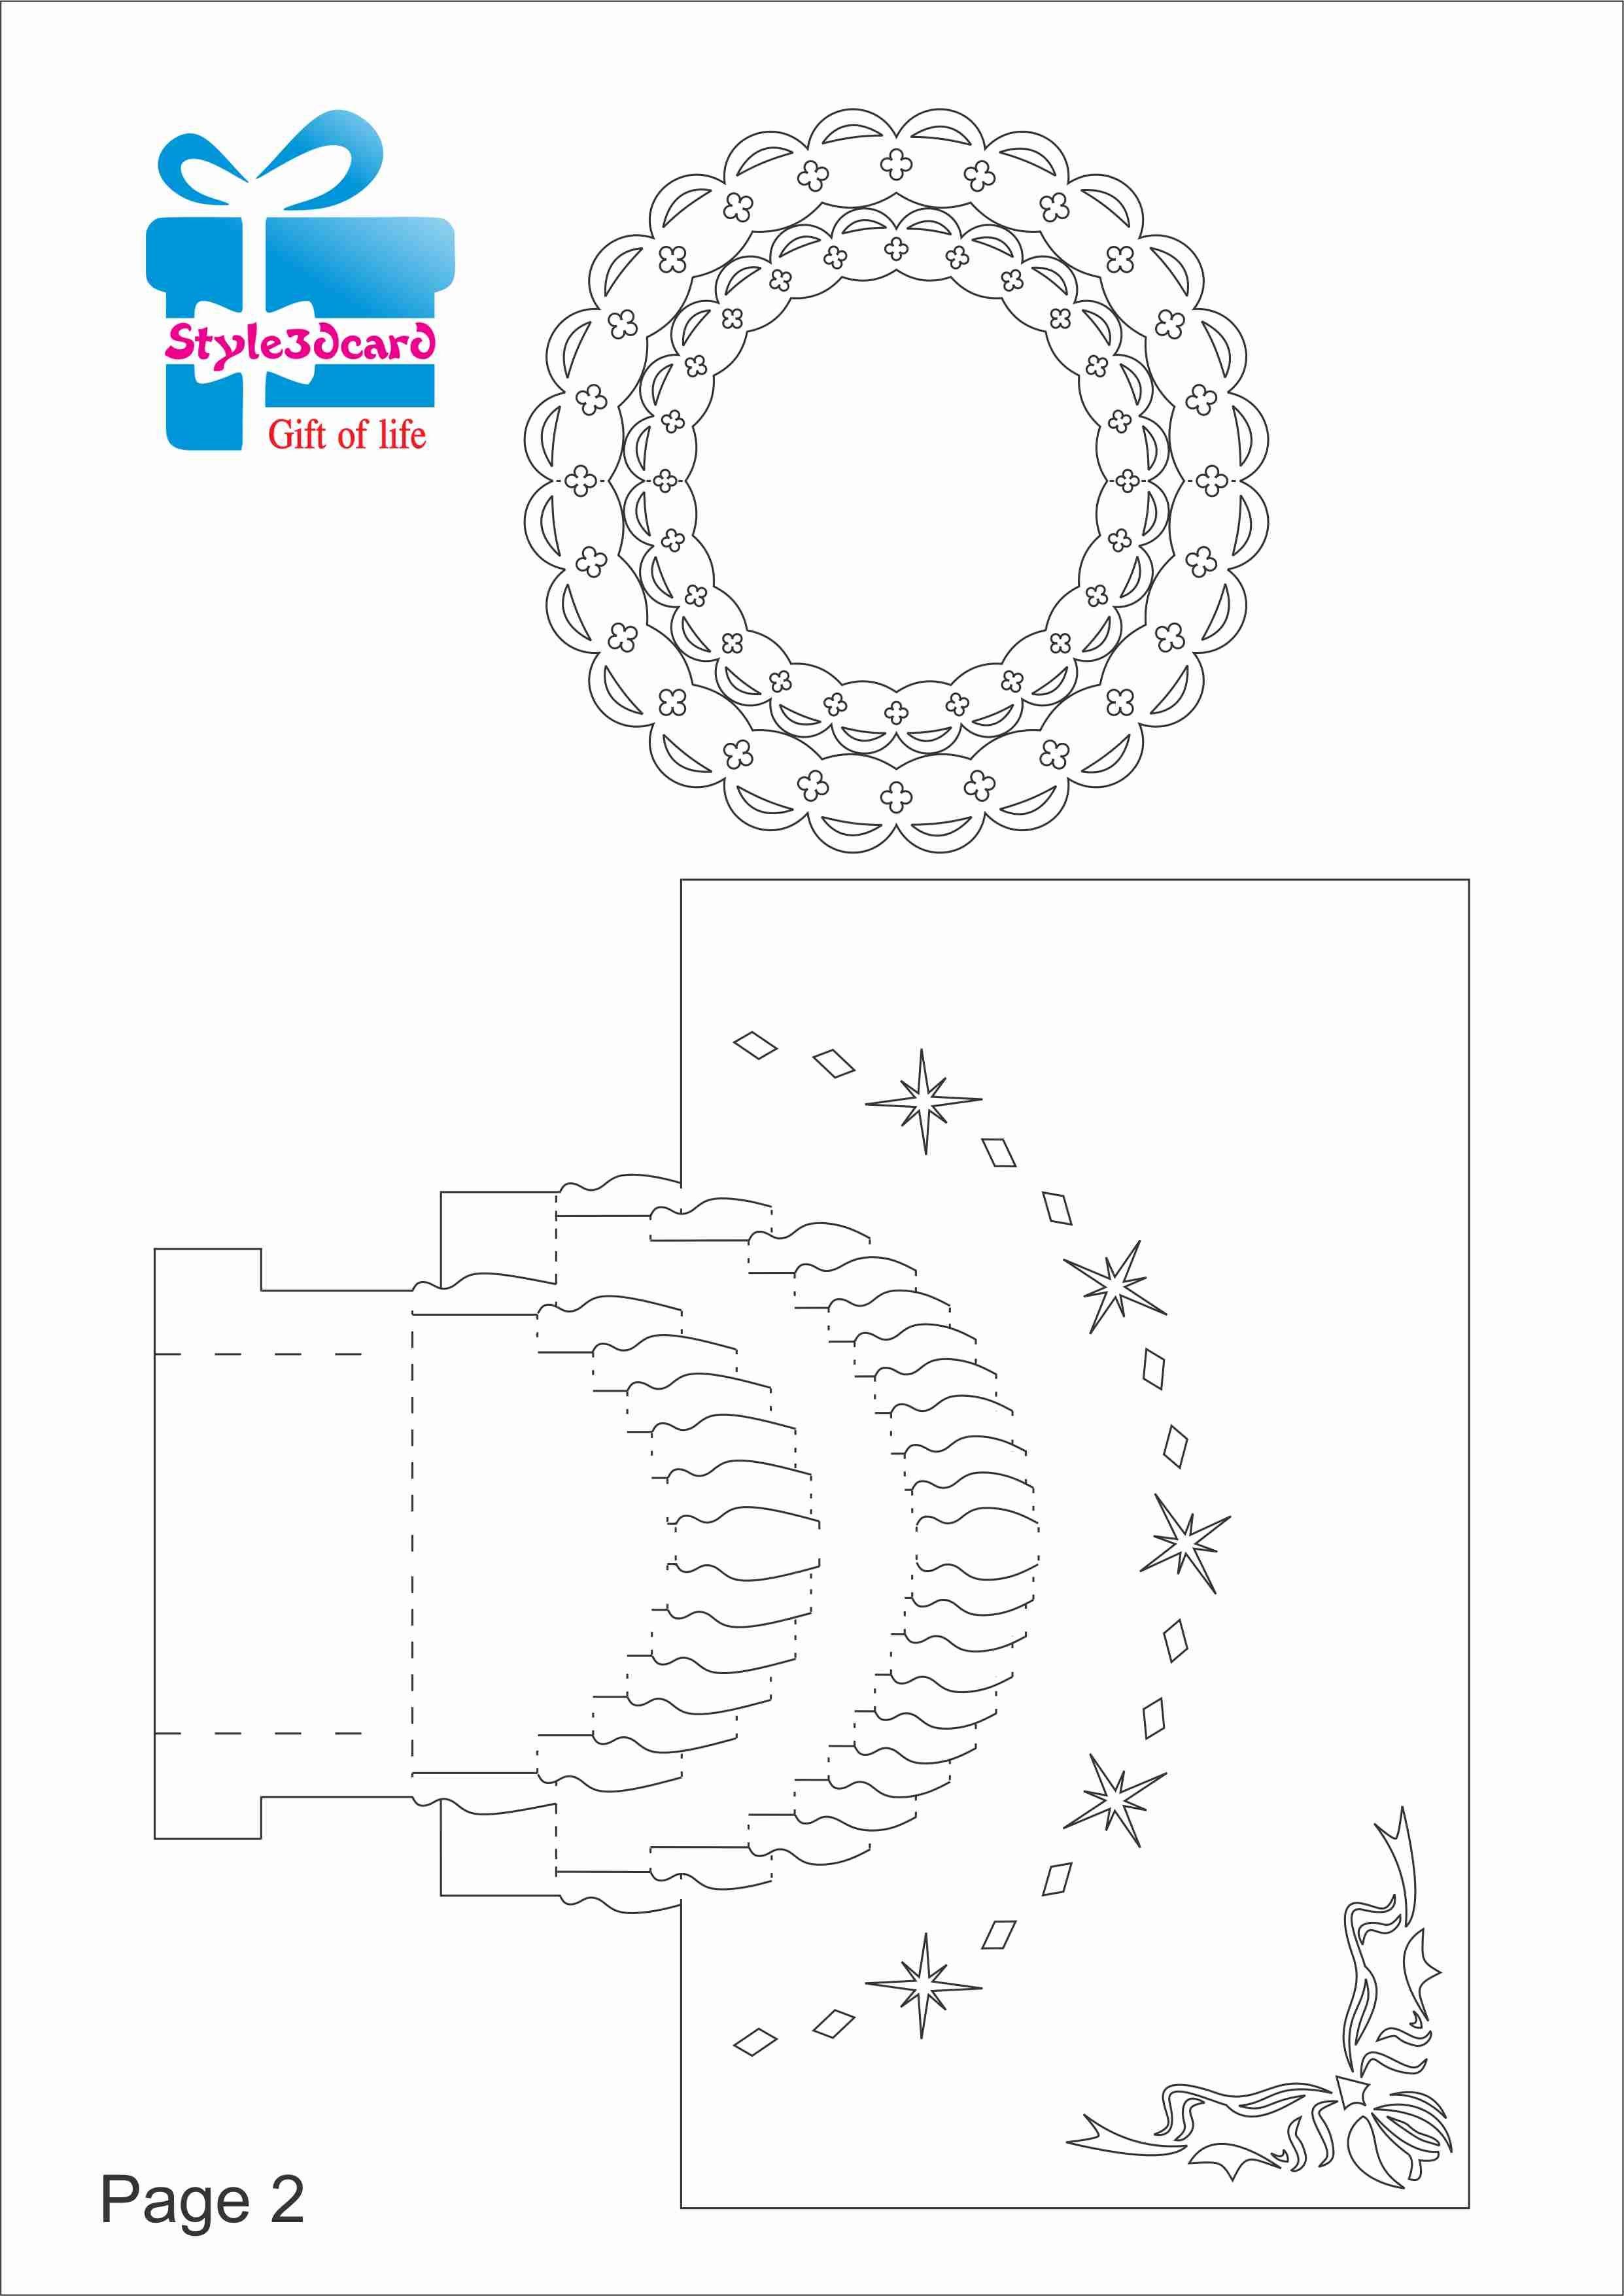 Happy Birthday-Cake-3D-Pop-Up-Greeting-Card/ Kirigami Pattern 2   1 - Free Printable Kirigami Pop Up Card Patterns